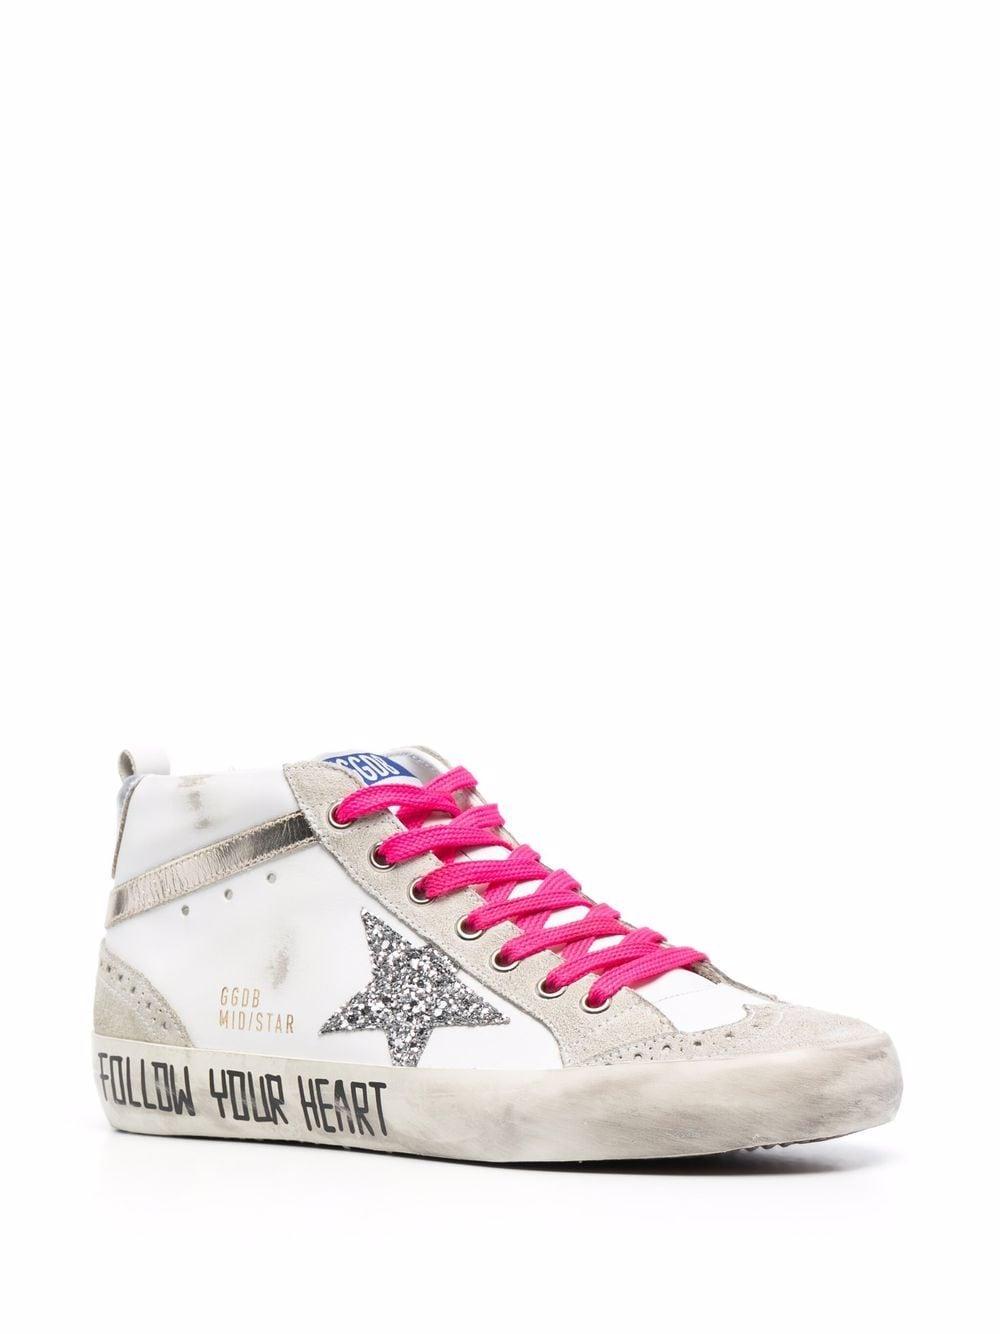 Picture of Golden Goose Deluxe Brand   Slogan-Print Mid-Star Sneakers